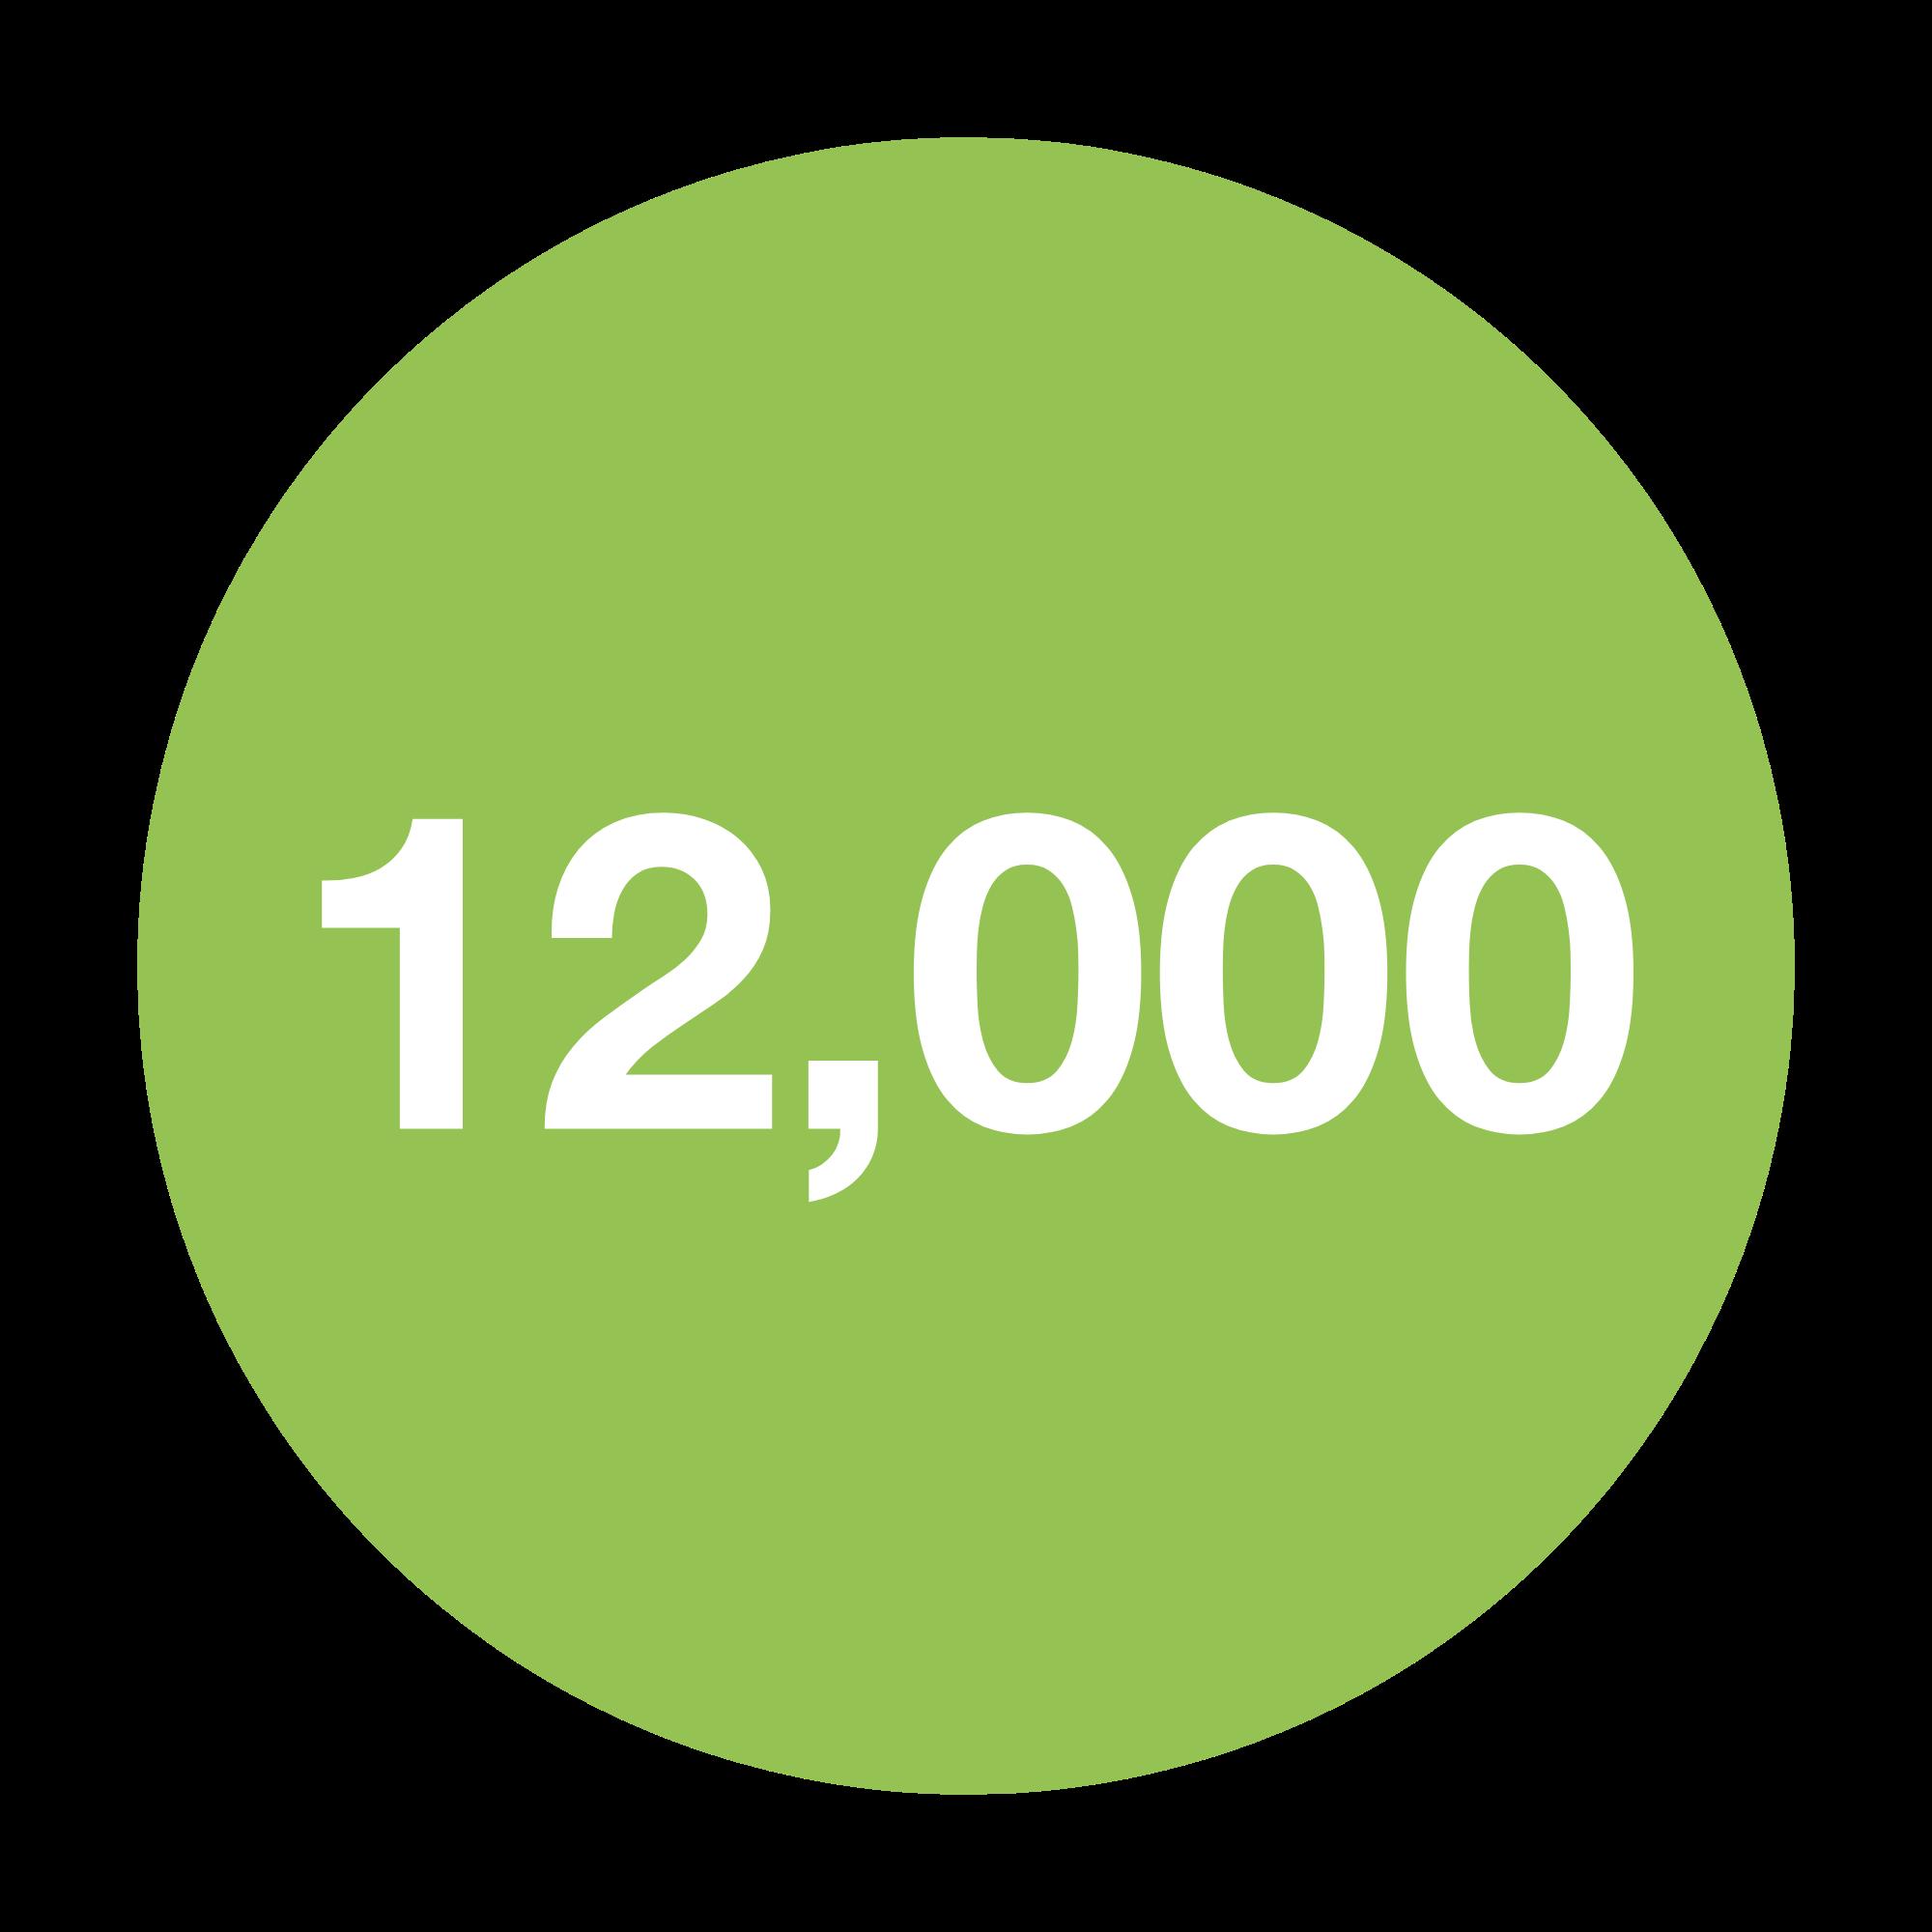 12,000